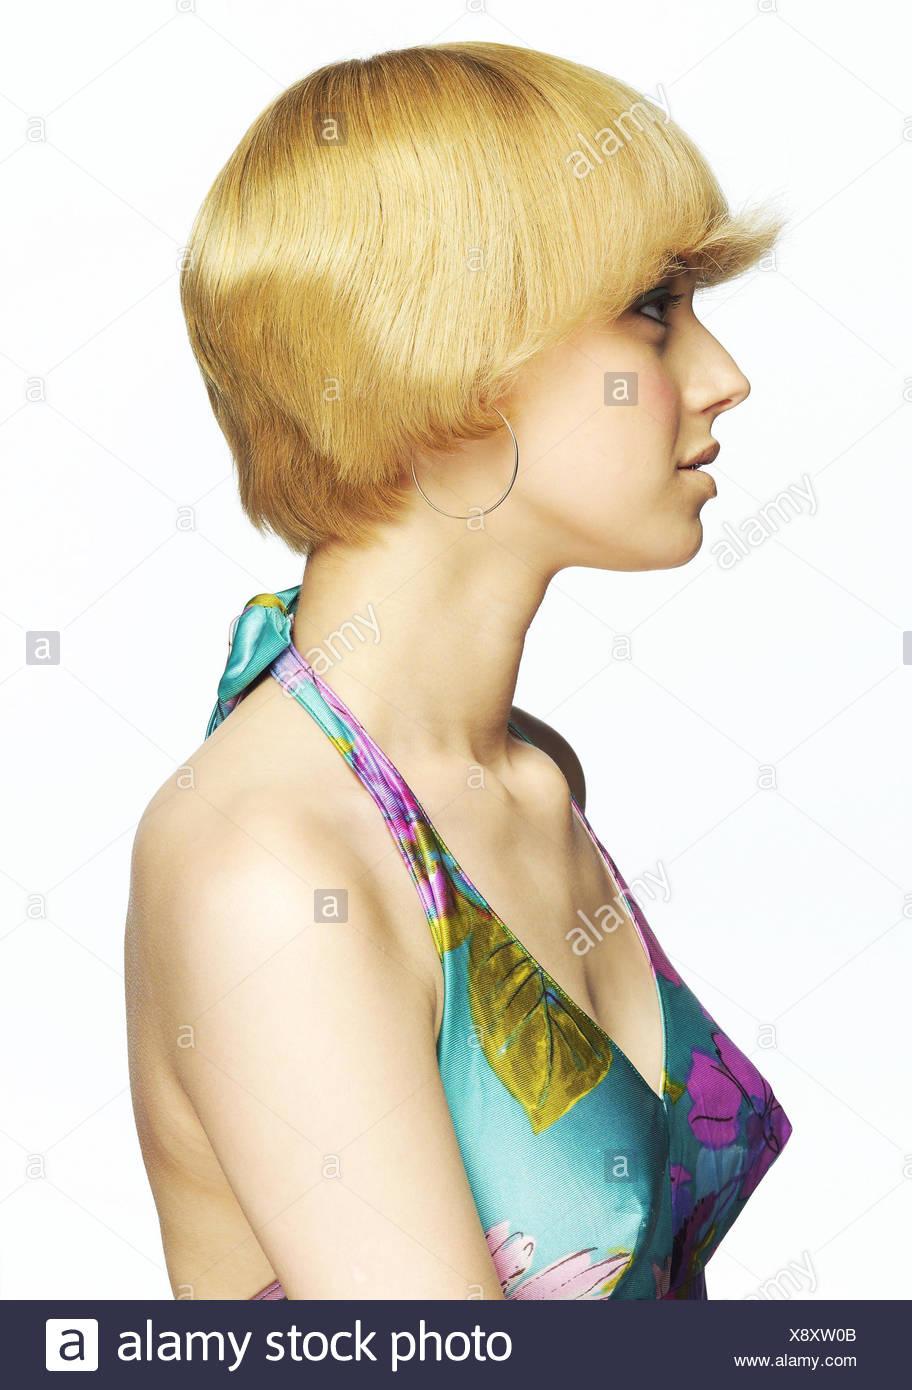 Frau Jung Blond Seite Porträt Frauen Porträt 20 30